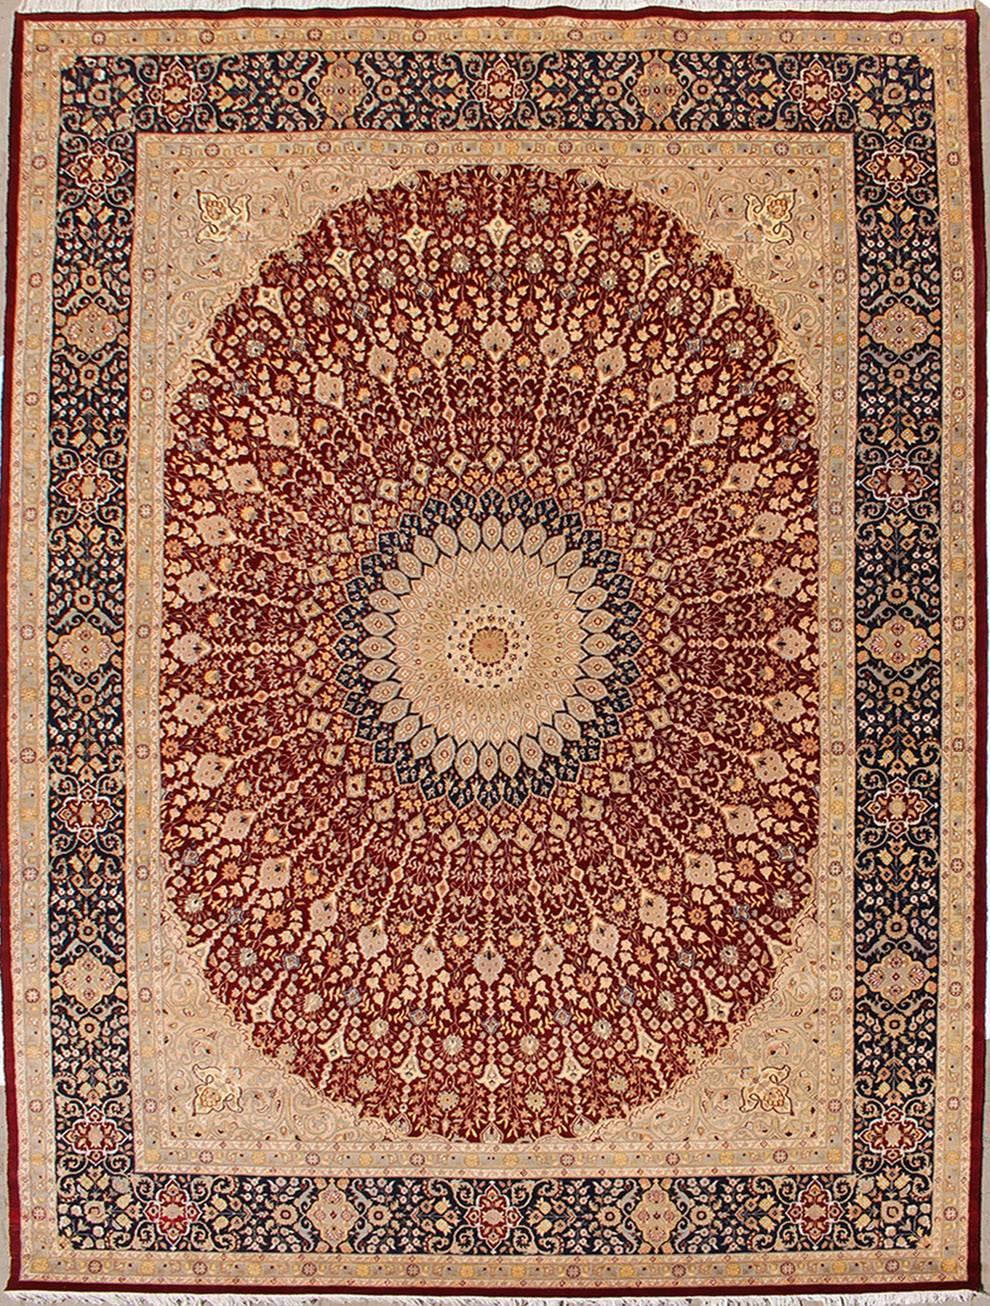 11 39 9x18 39 1 Rug Floral Handmade Pak Persian High Quality